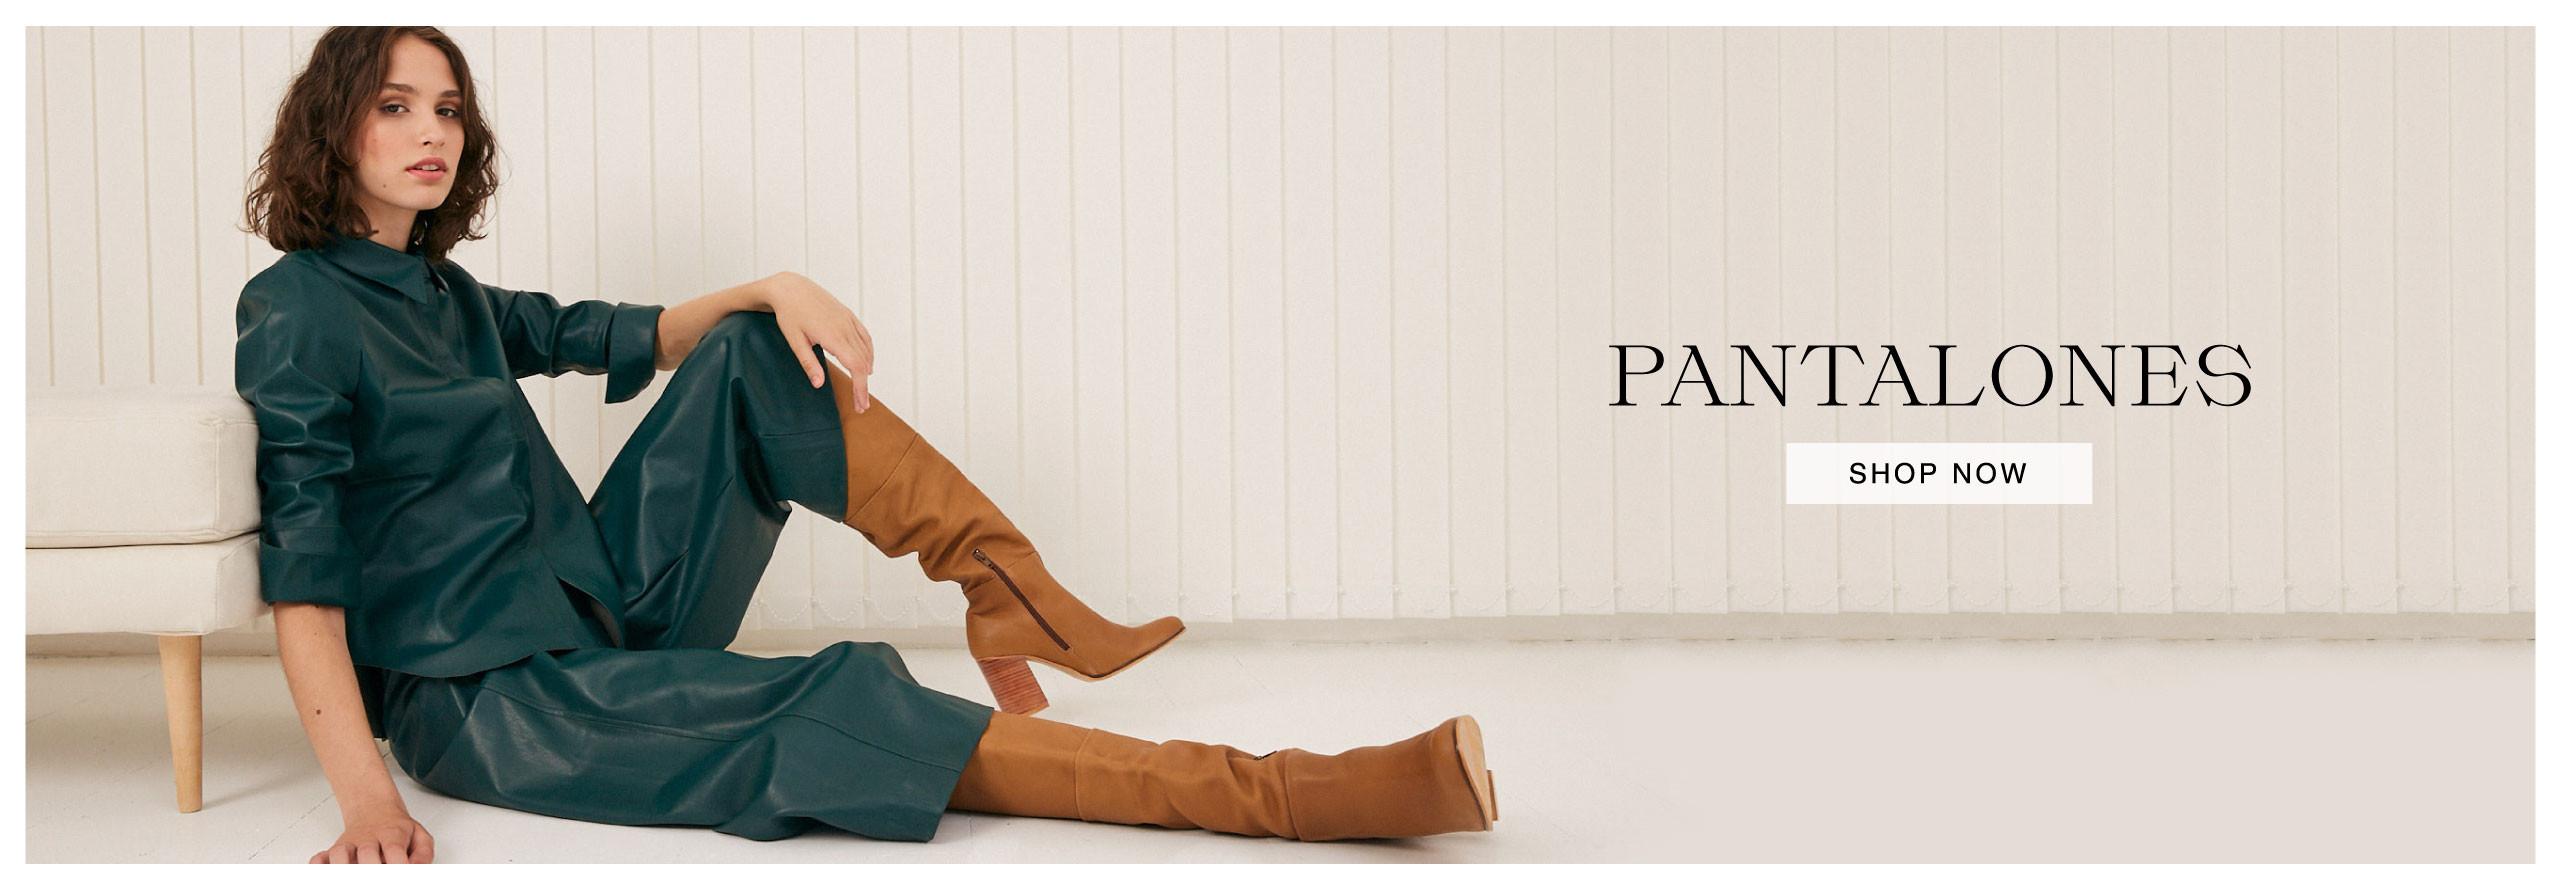 Pantalones - Home Mobile